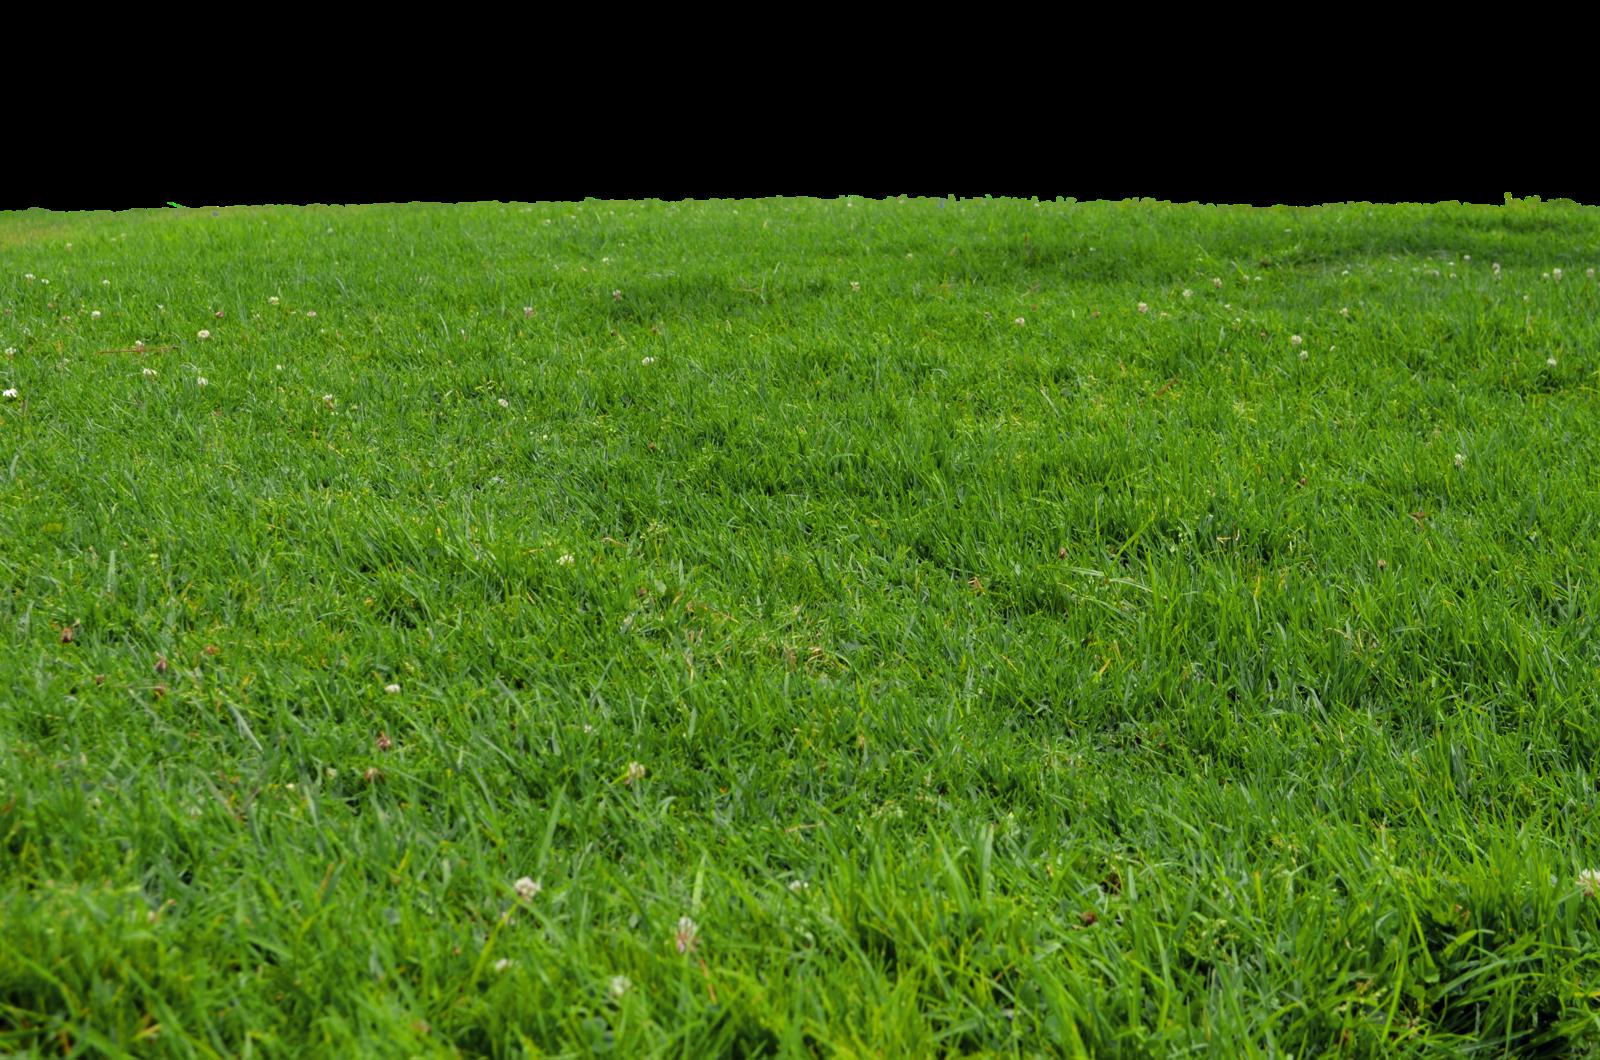 Hills clipart carpet grass. Png transparent images all